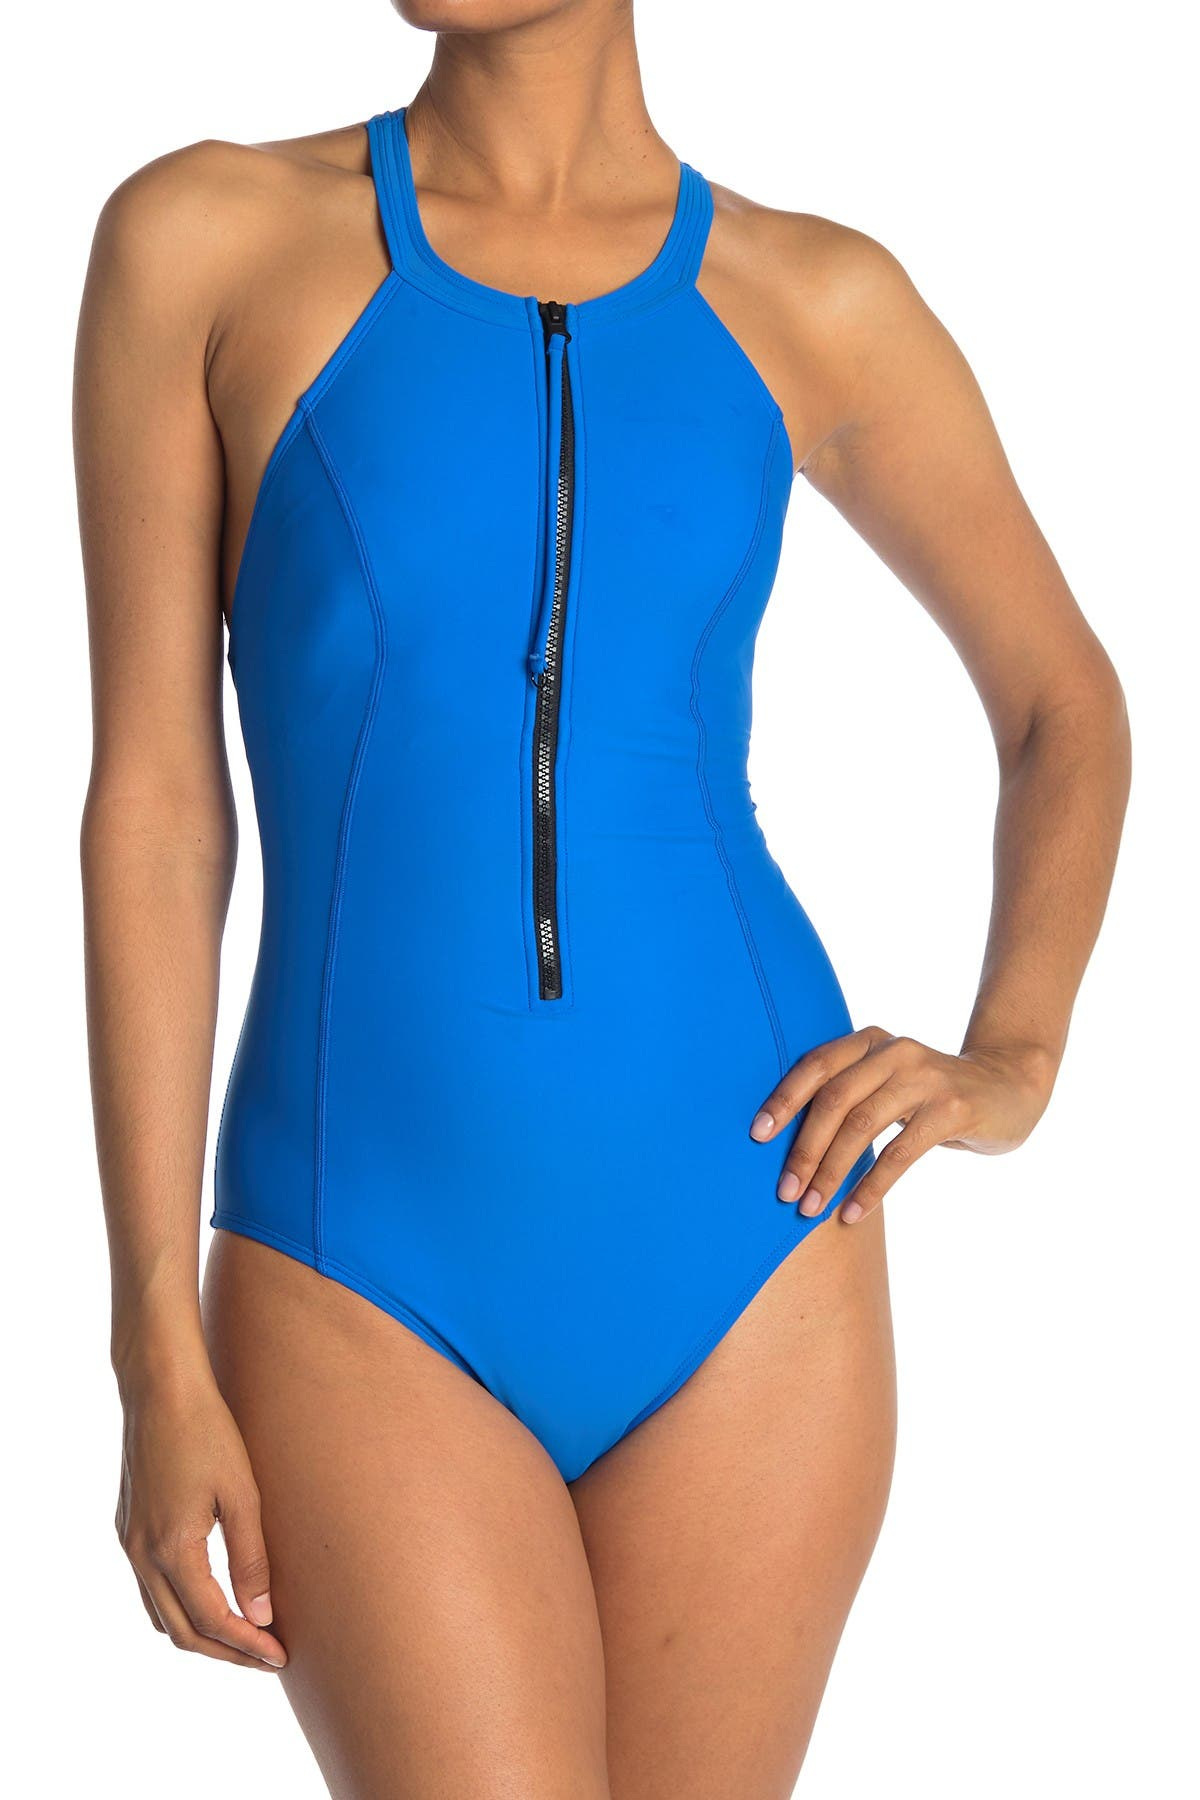 Image of Reebok Zip Front One-Piece Swimsuit